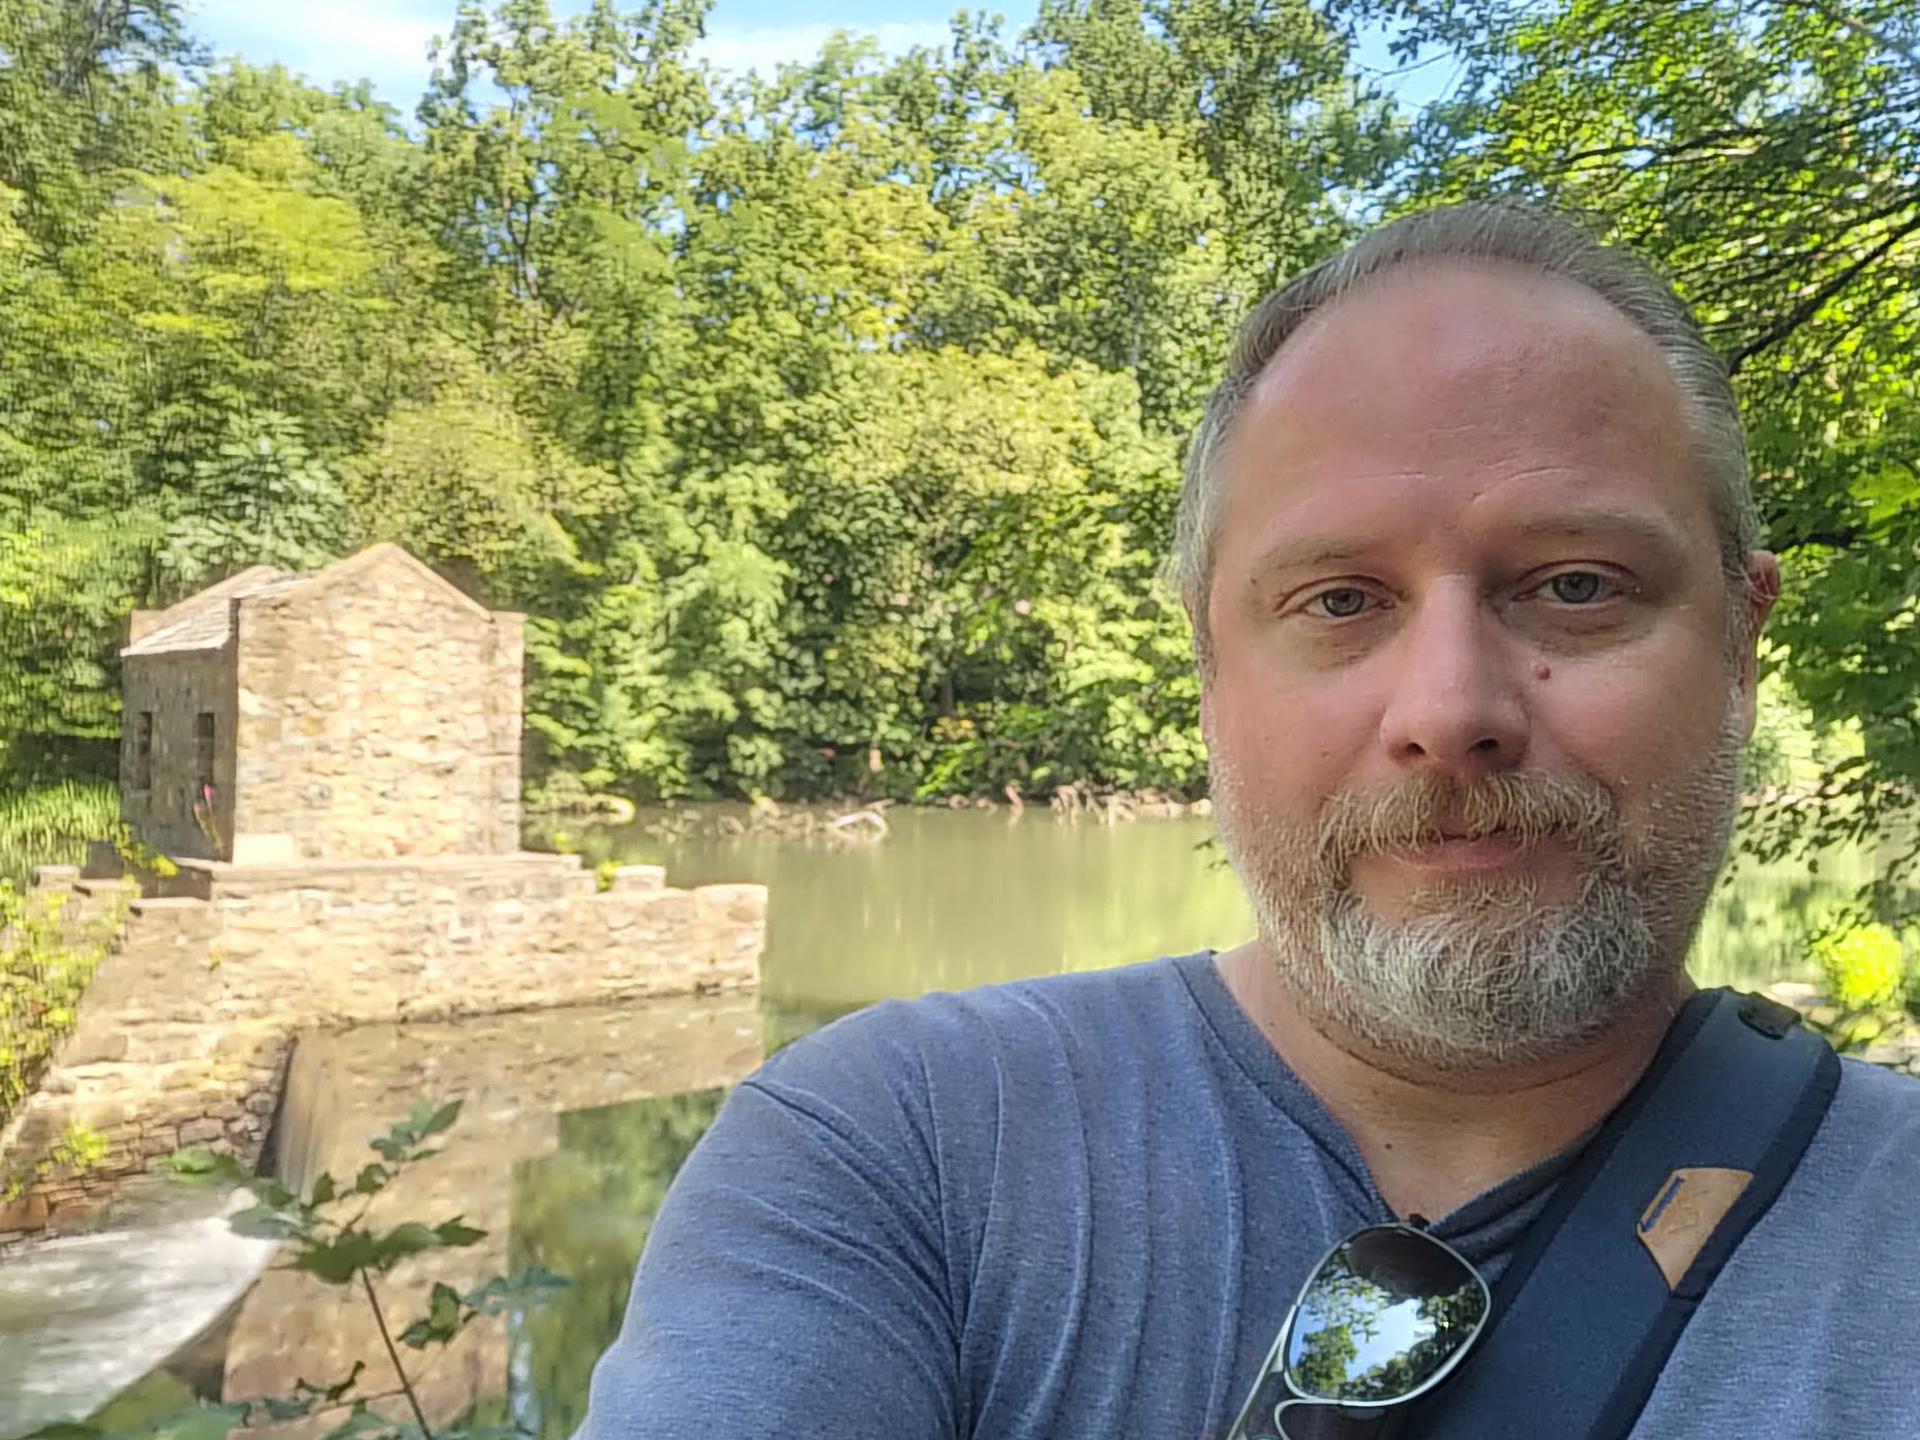 Samsung Galaxy Z Fold 3 photo sample selfie UDC of a man with a beard wearing a blue t-shirt.